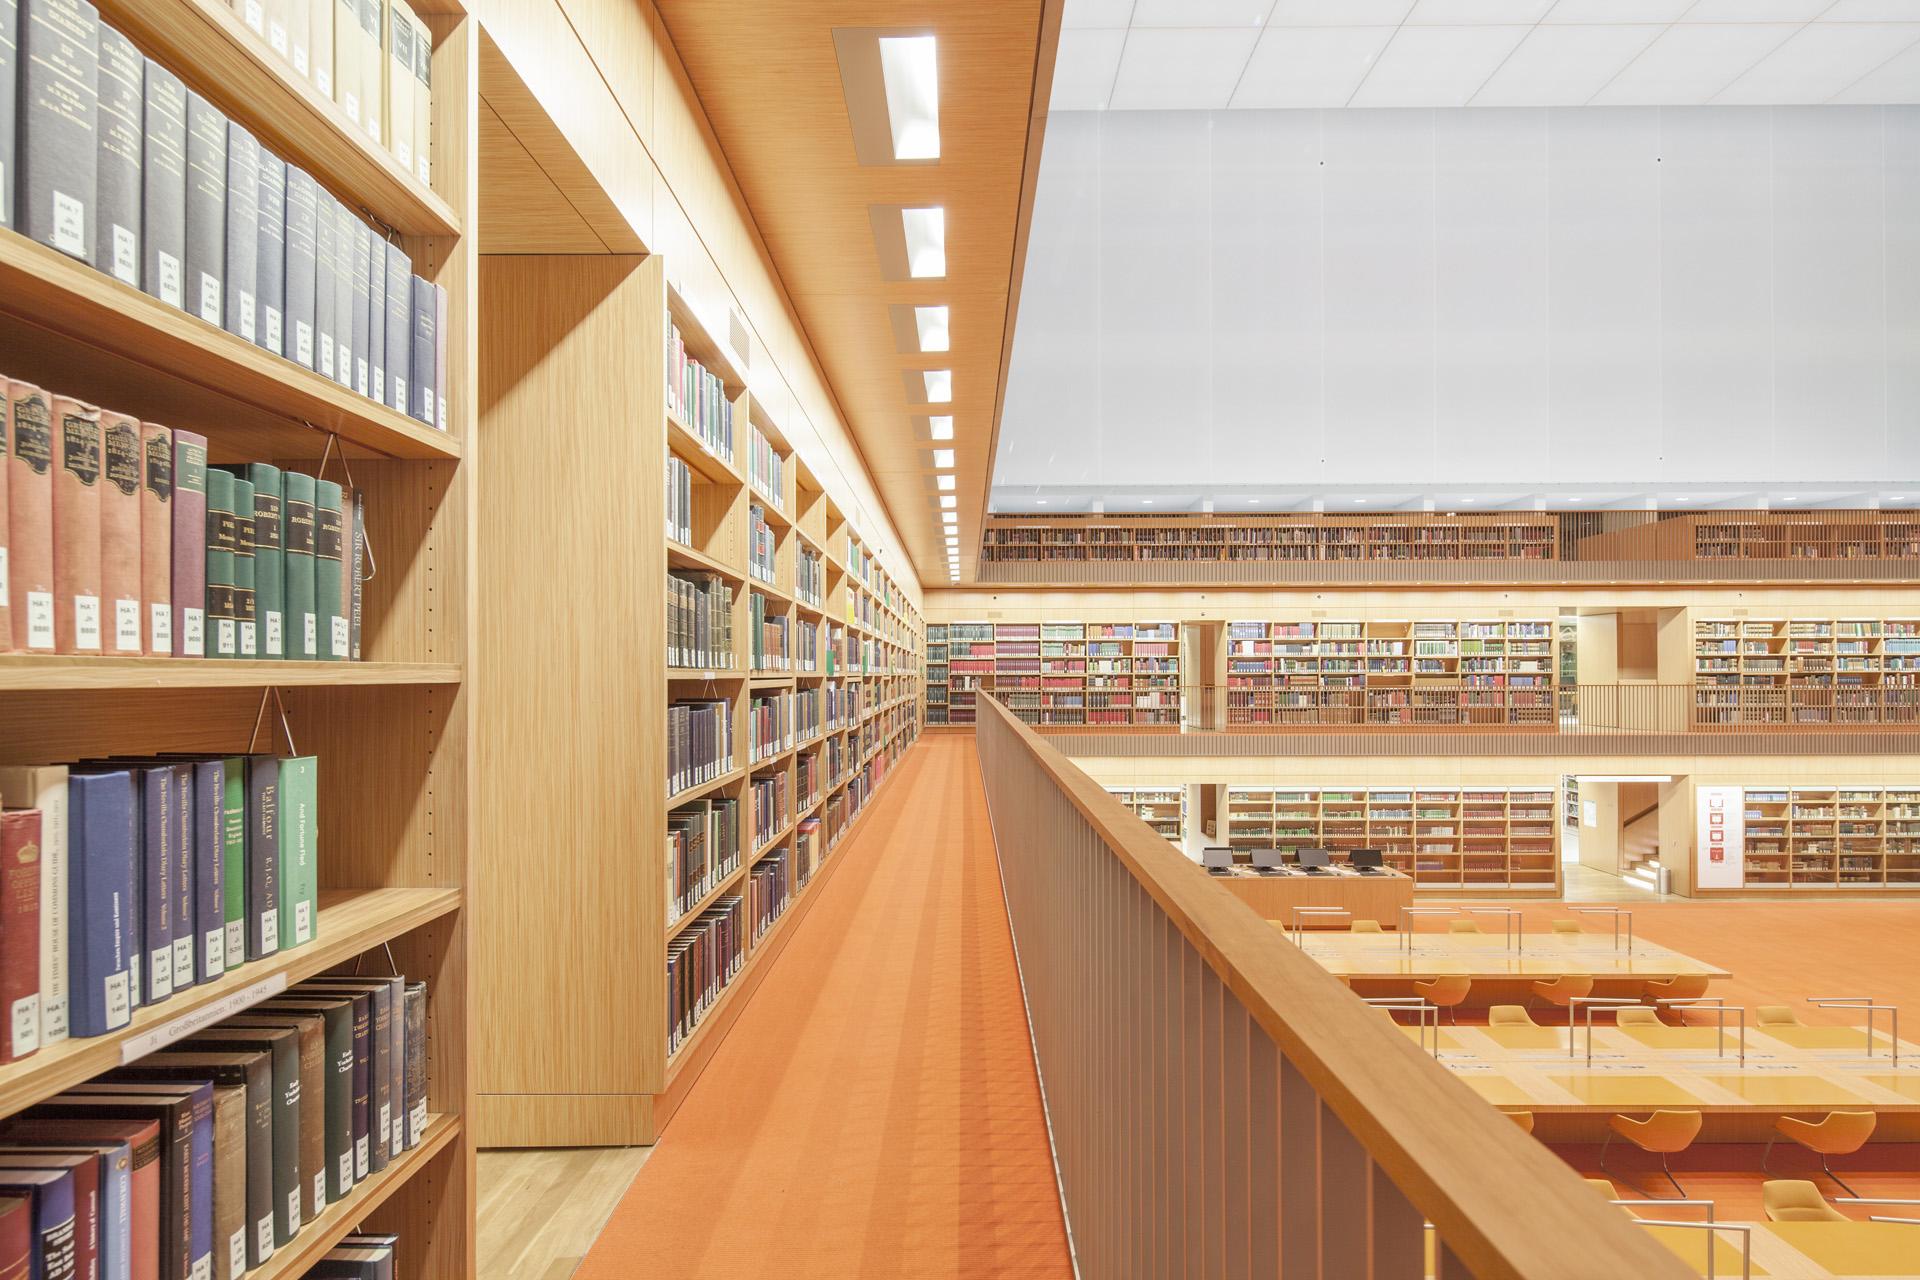 MG 0032x - Staatsbibliothek Berlin